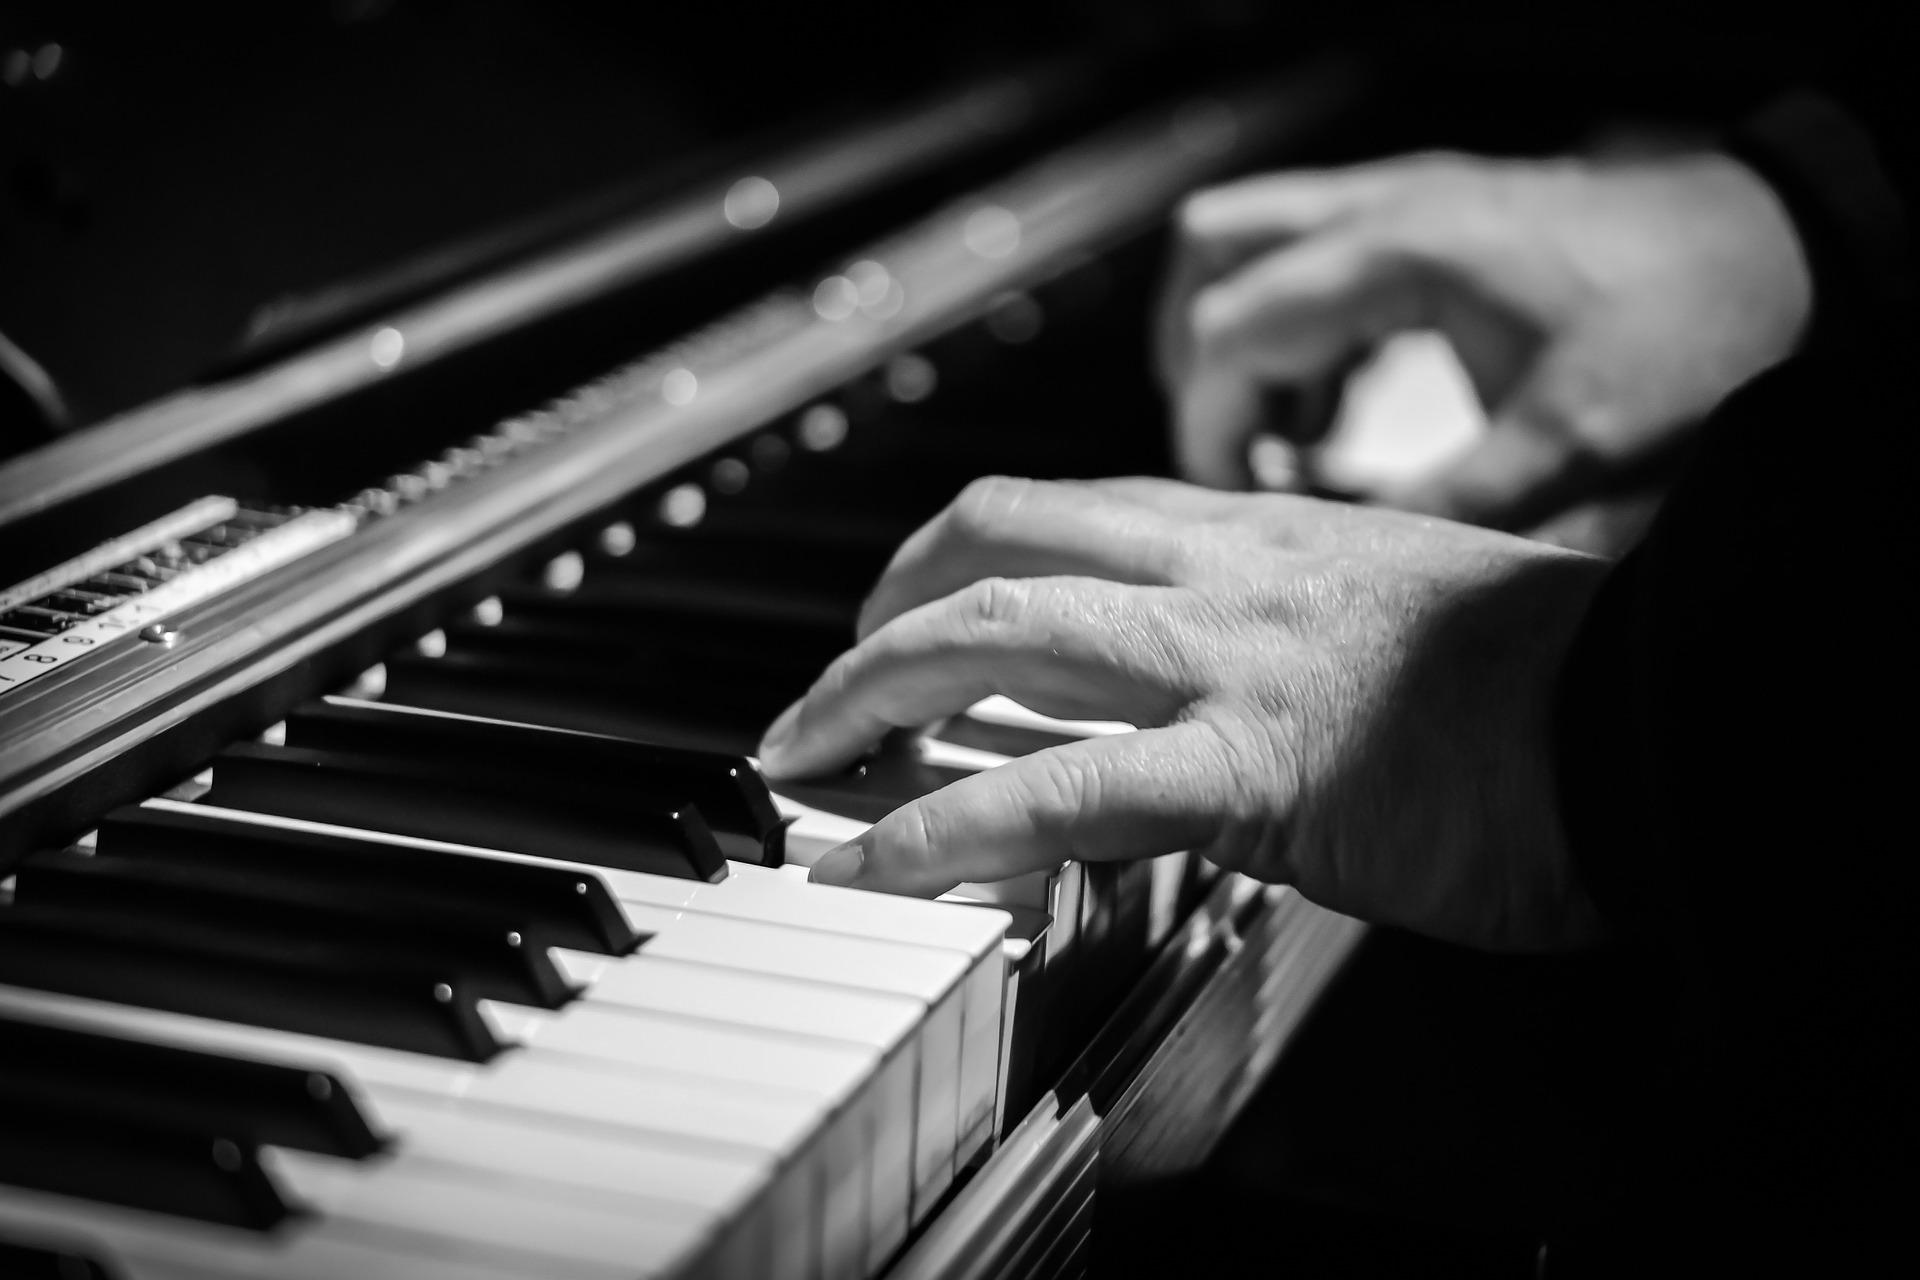 http://www.jazzpianodays.com/wp-content/uploads/piano-1039450_1920-1.jpg